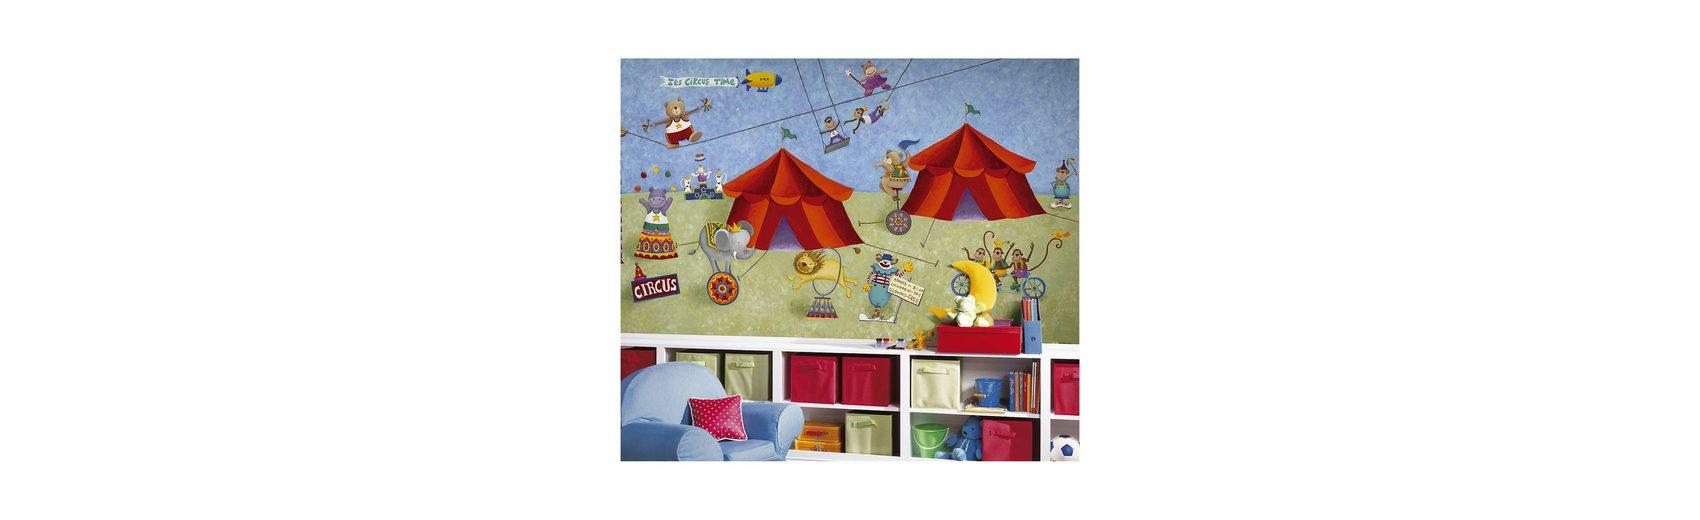 RoomMates Fototapete Zirkus, 320 x 183 cm